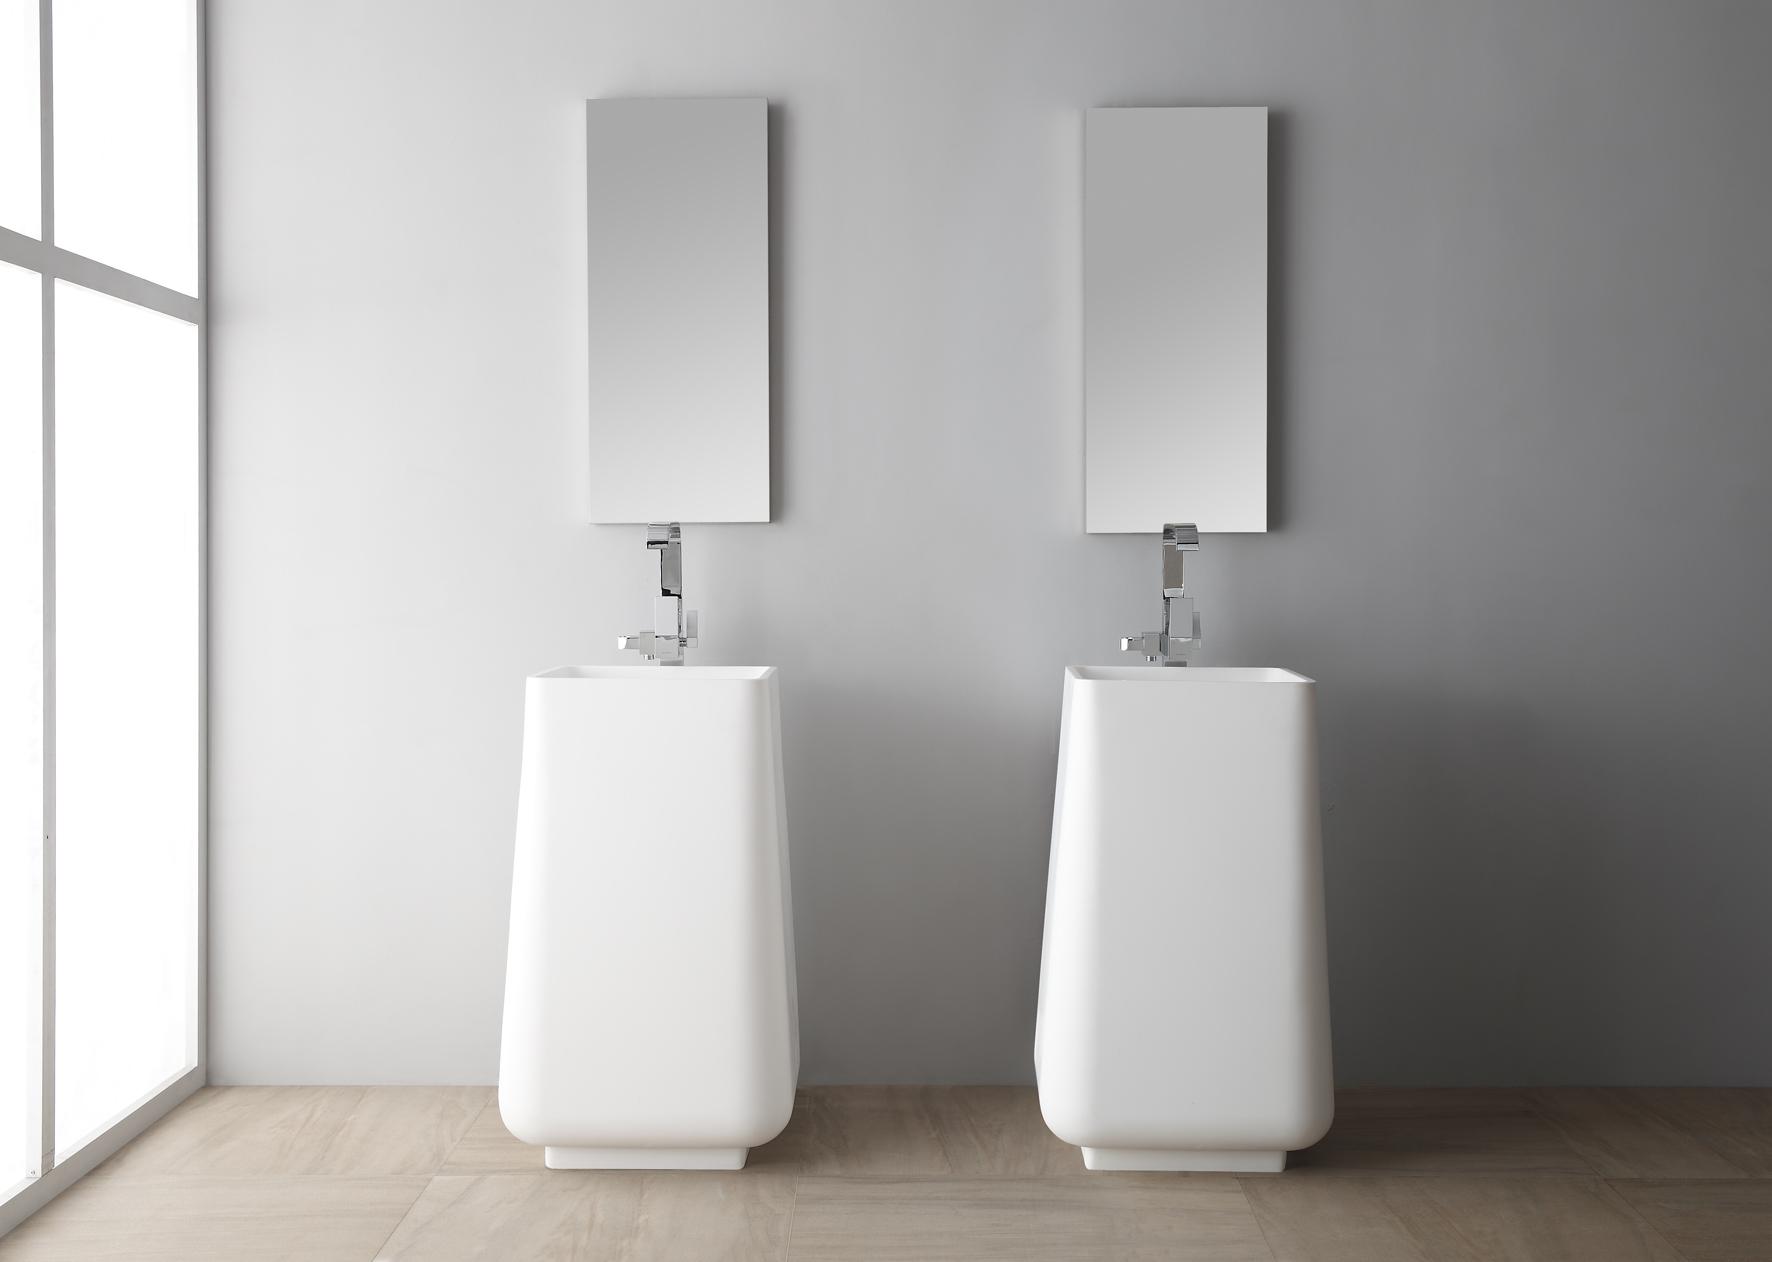 Квадратная, напольная раковина для ванной комнаты Монте Бианко